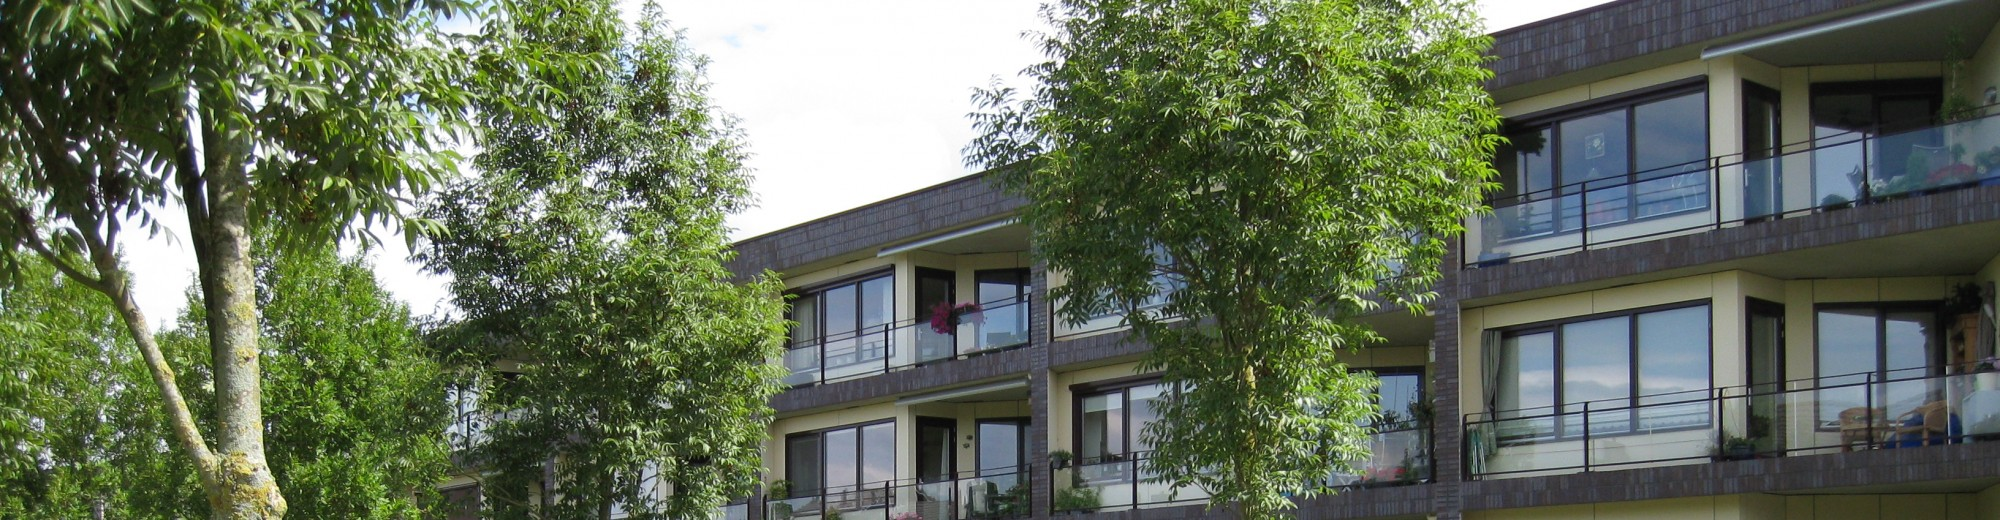 Woongroep Leestaete in Houten